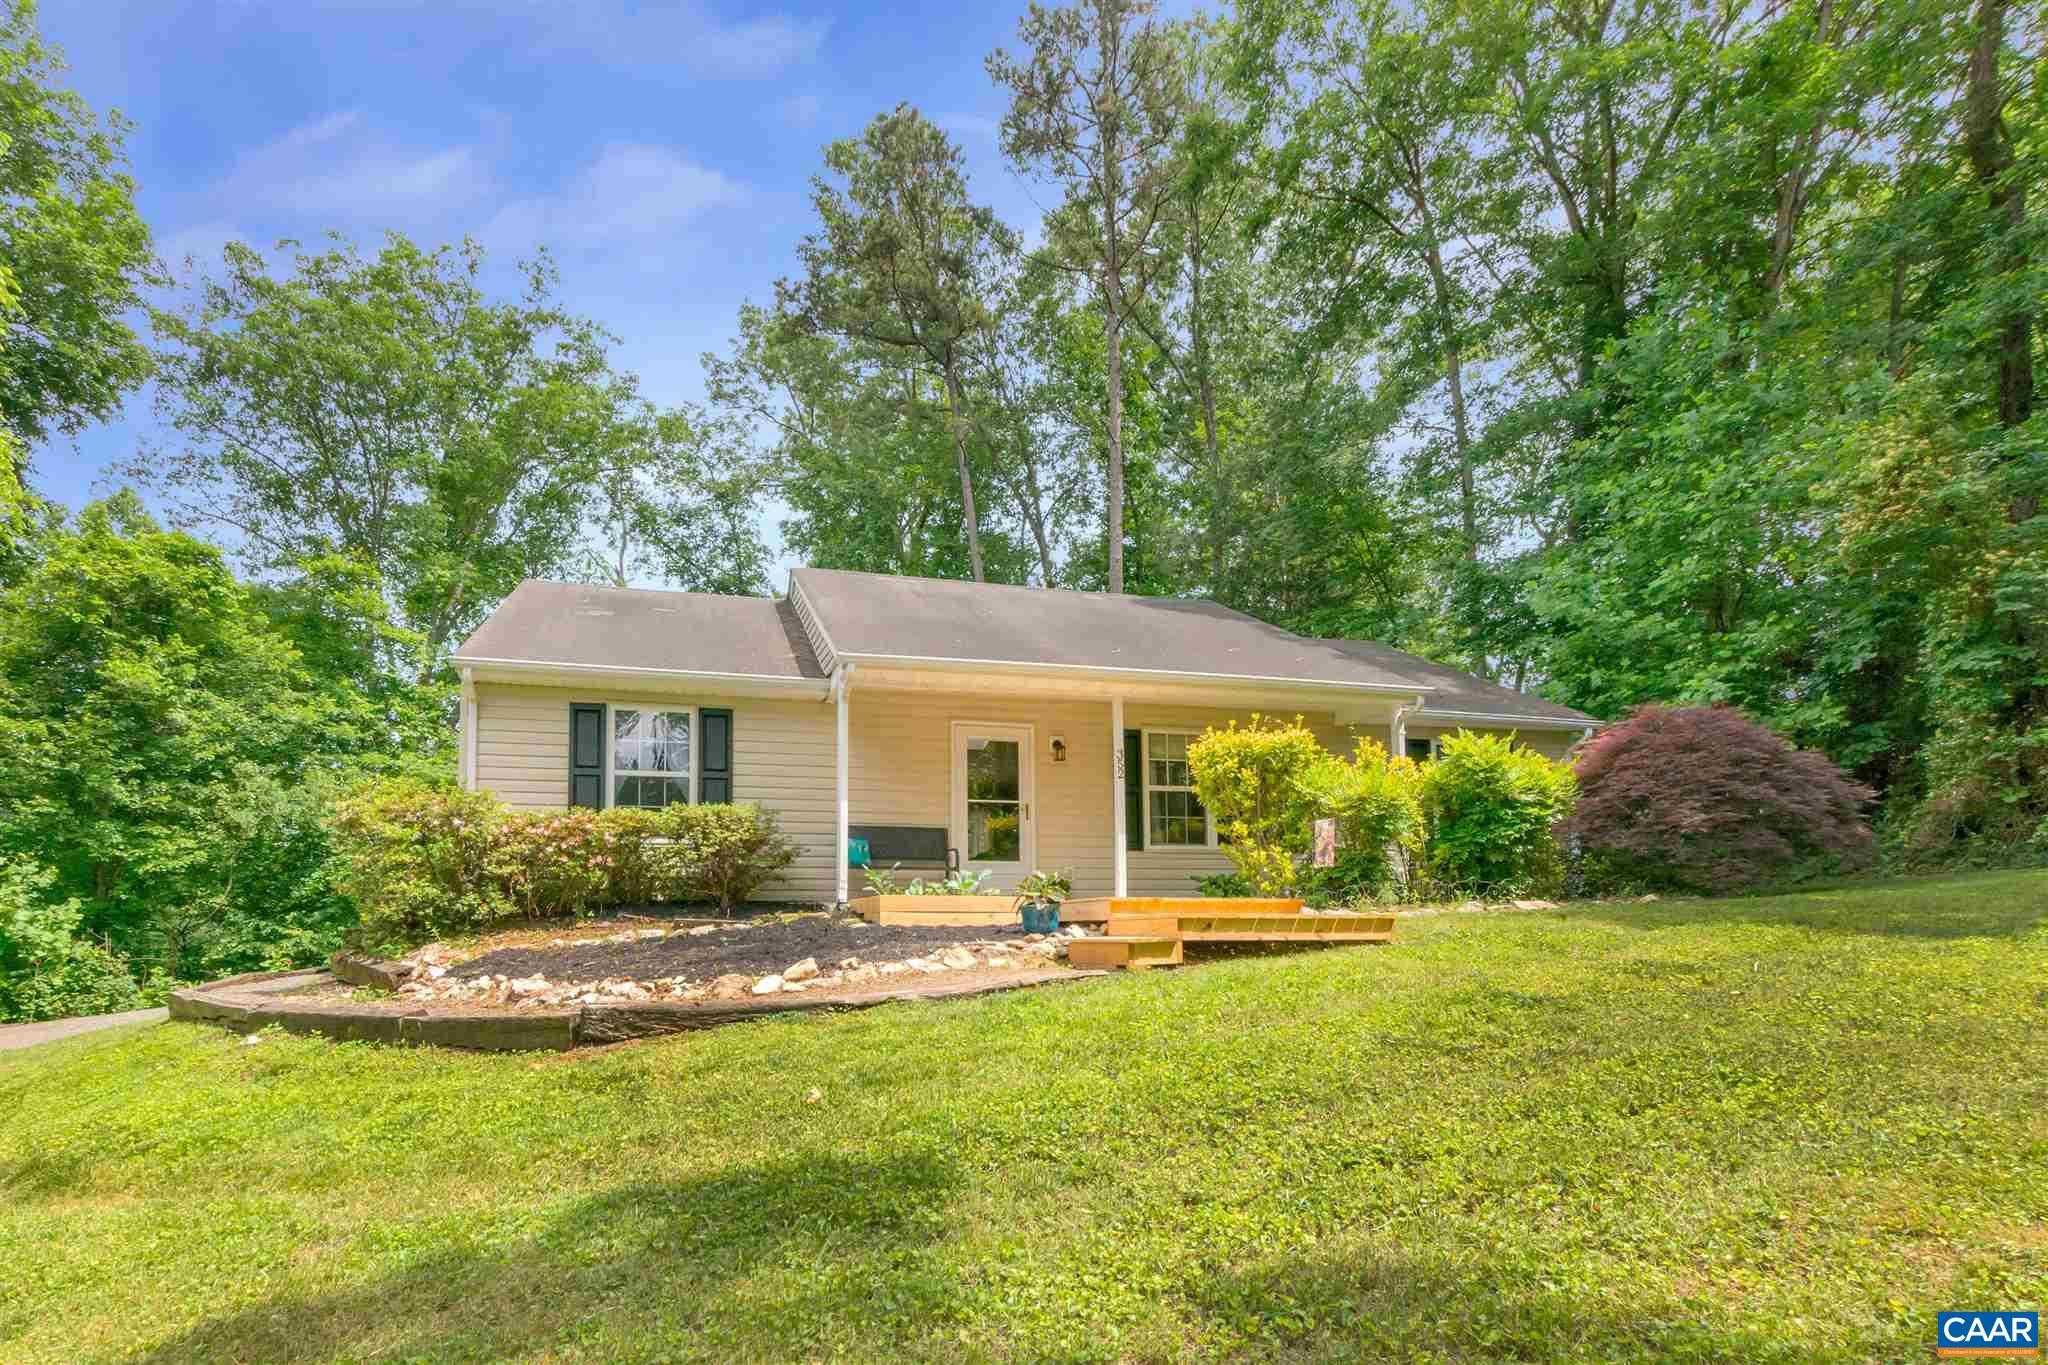 $225,000 - 3Br/2Ba -  for Sale in Twin Lakes Estates (greene), Ruckersville